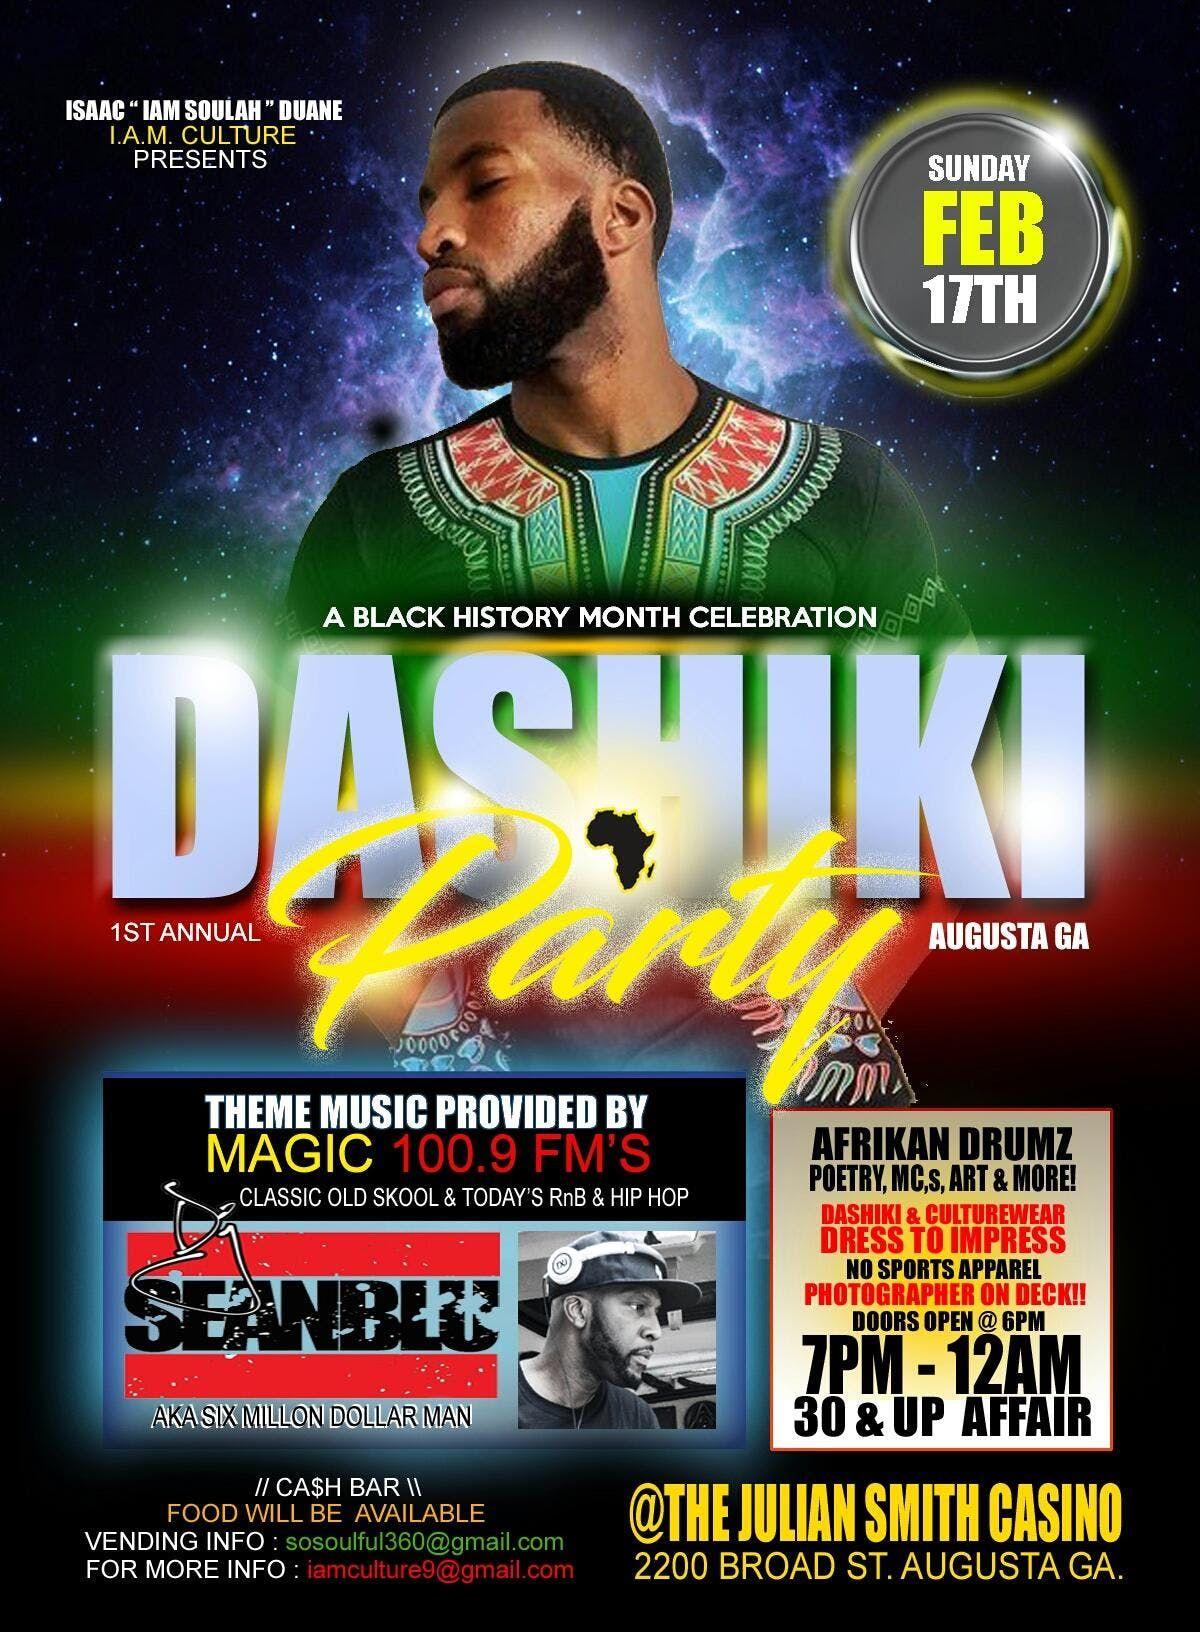 1st Annual Dashiki Party - Augusta GA.